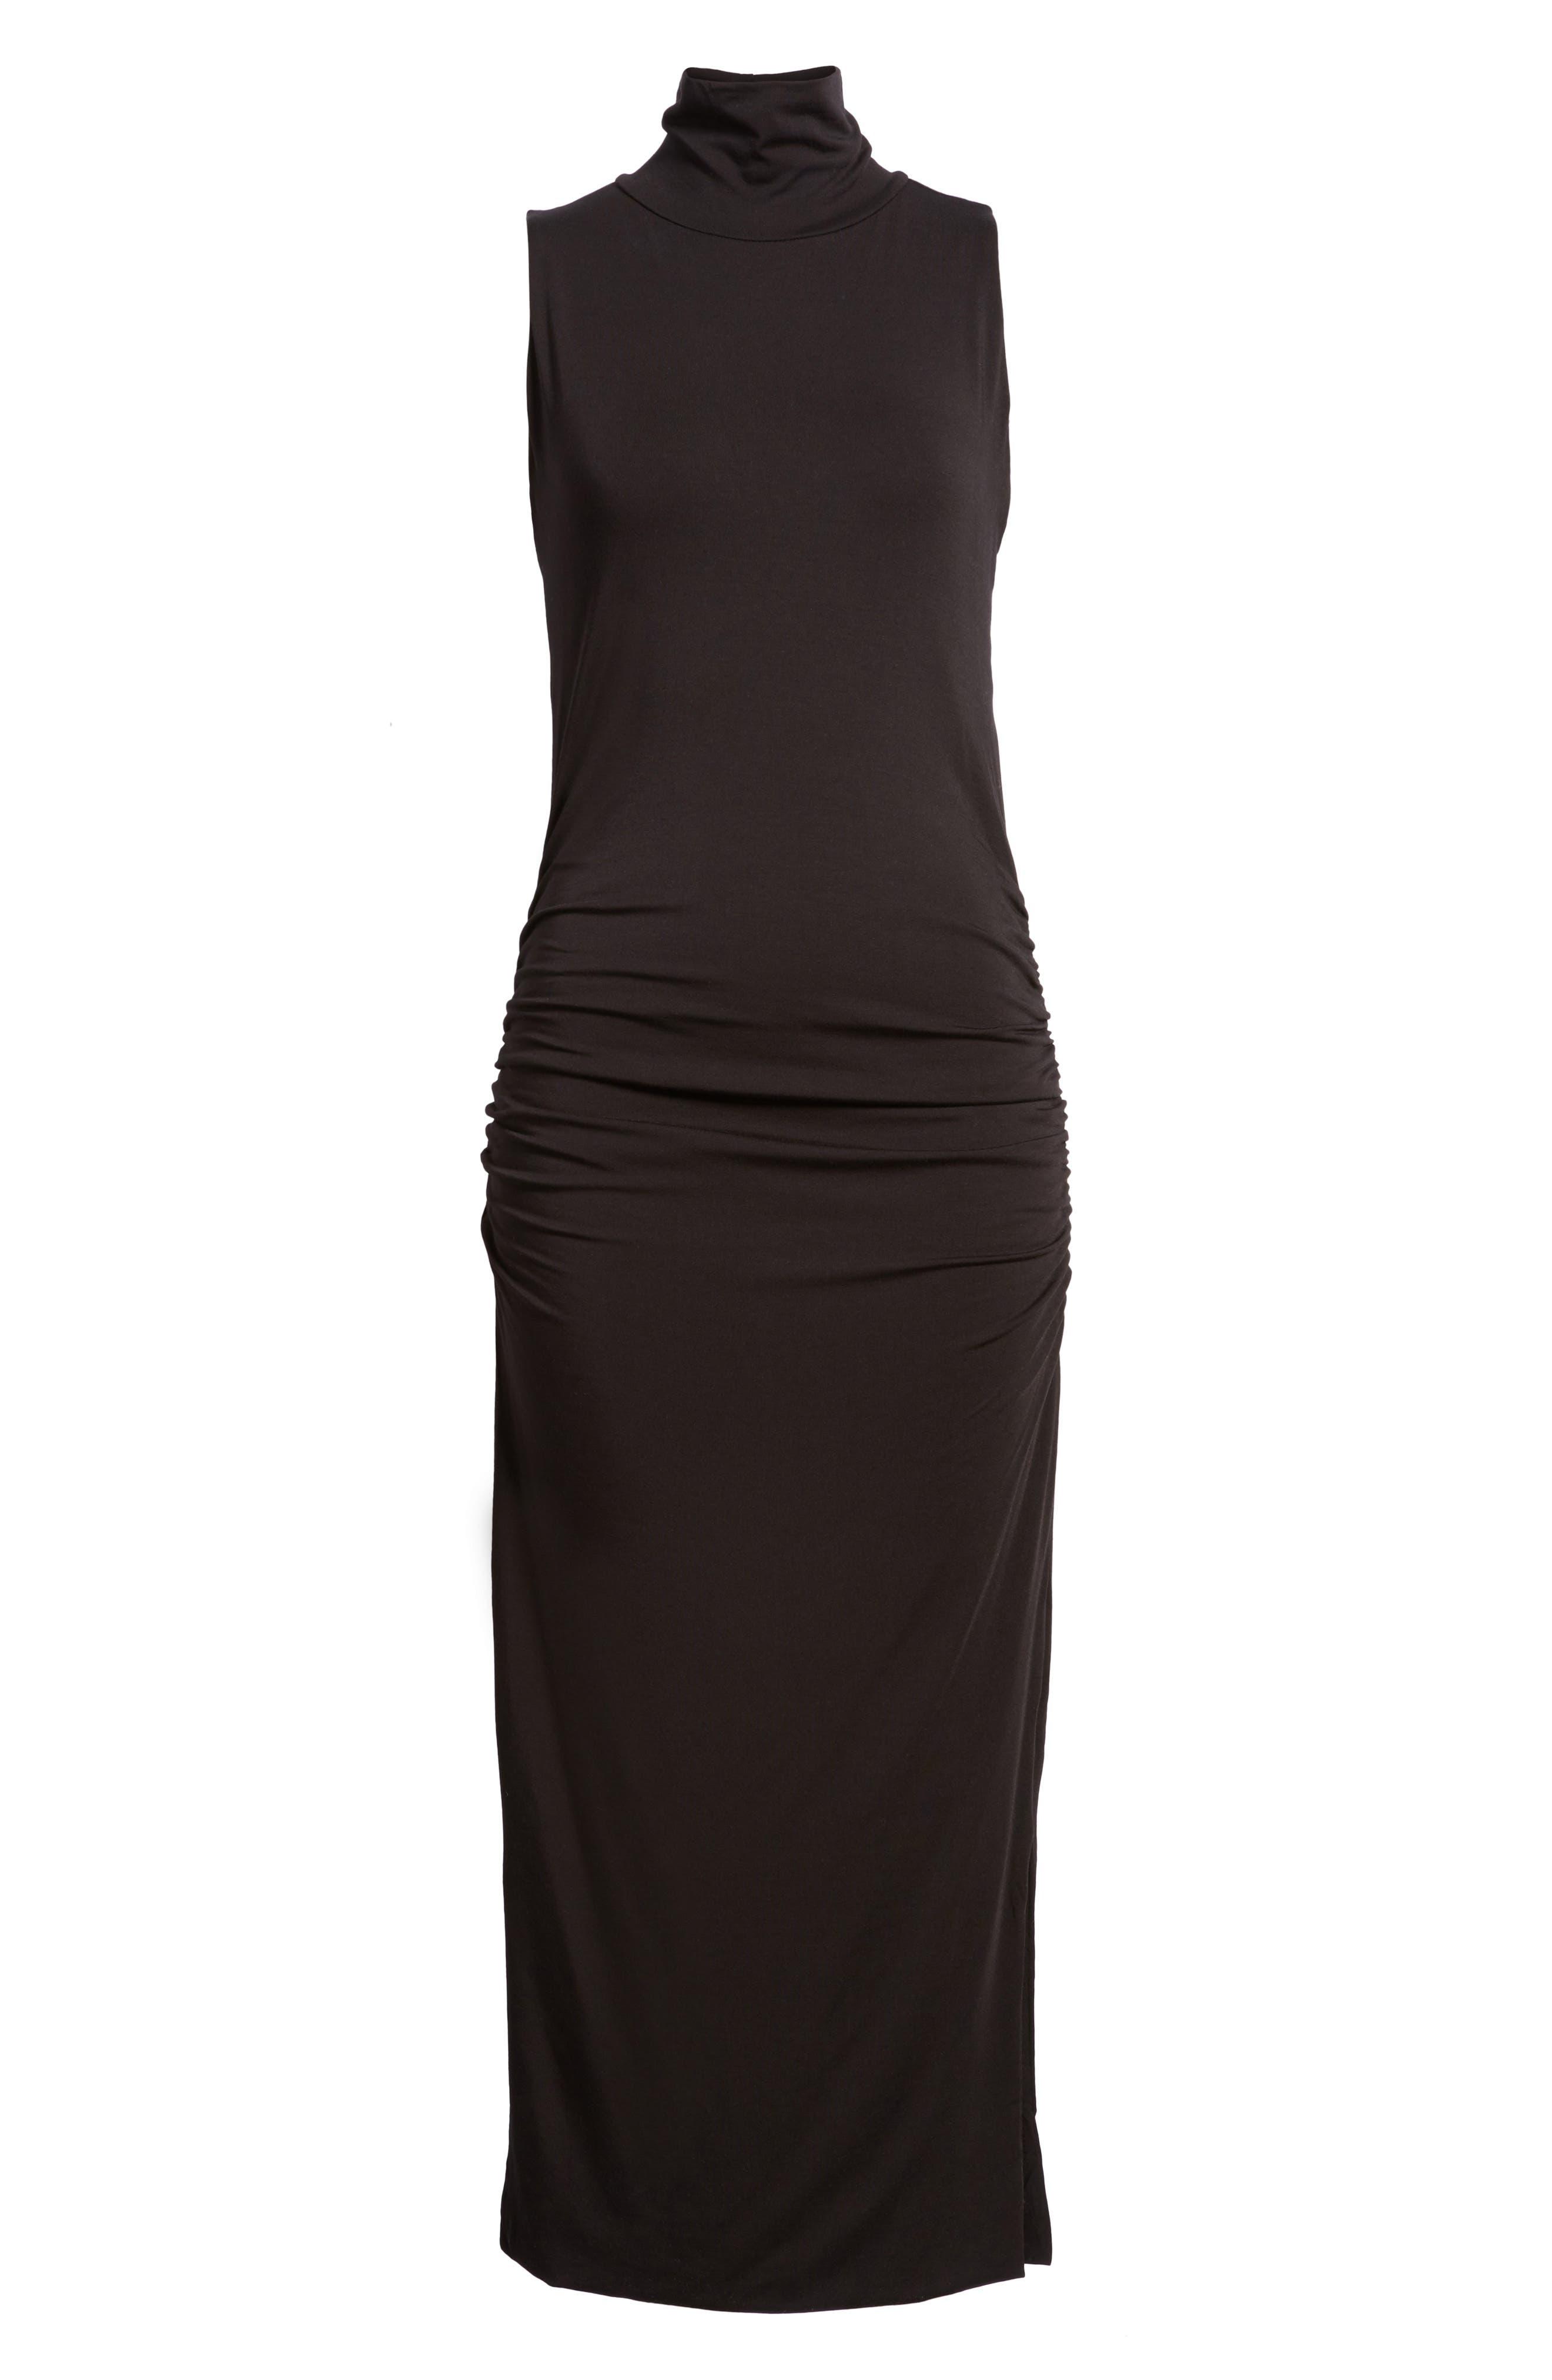 Turtleneck Maxi Dress,                             Alternate thumbnail 6, color,                             010